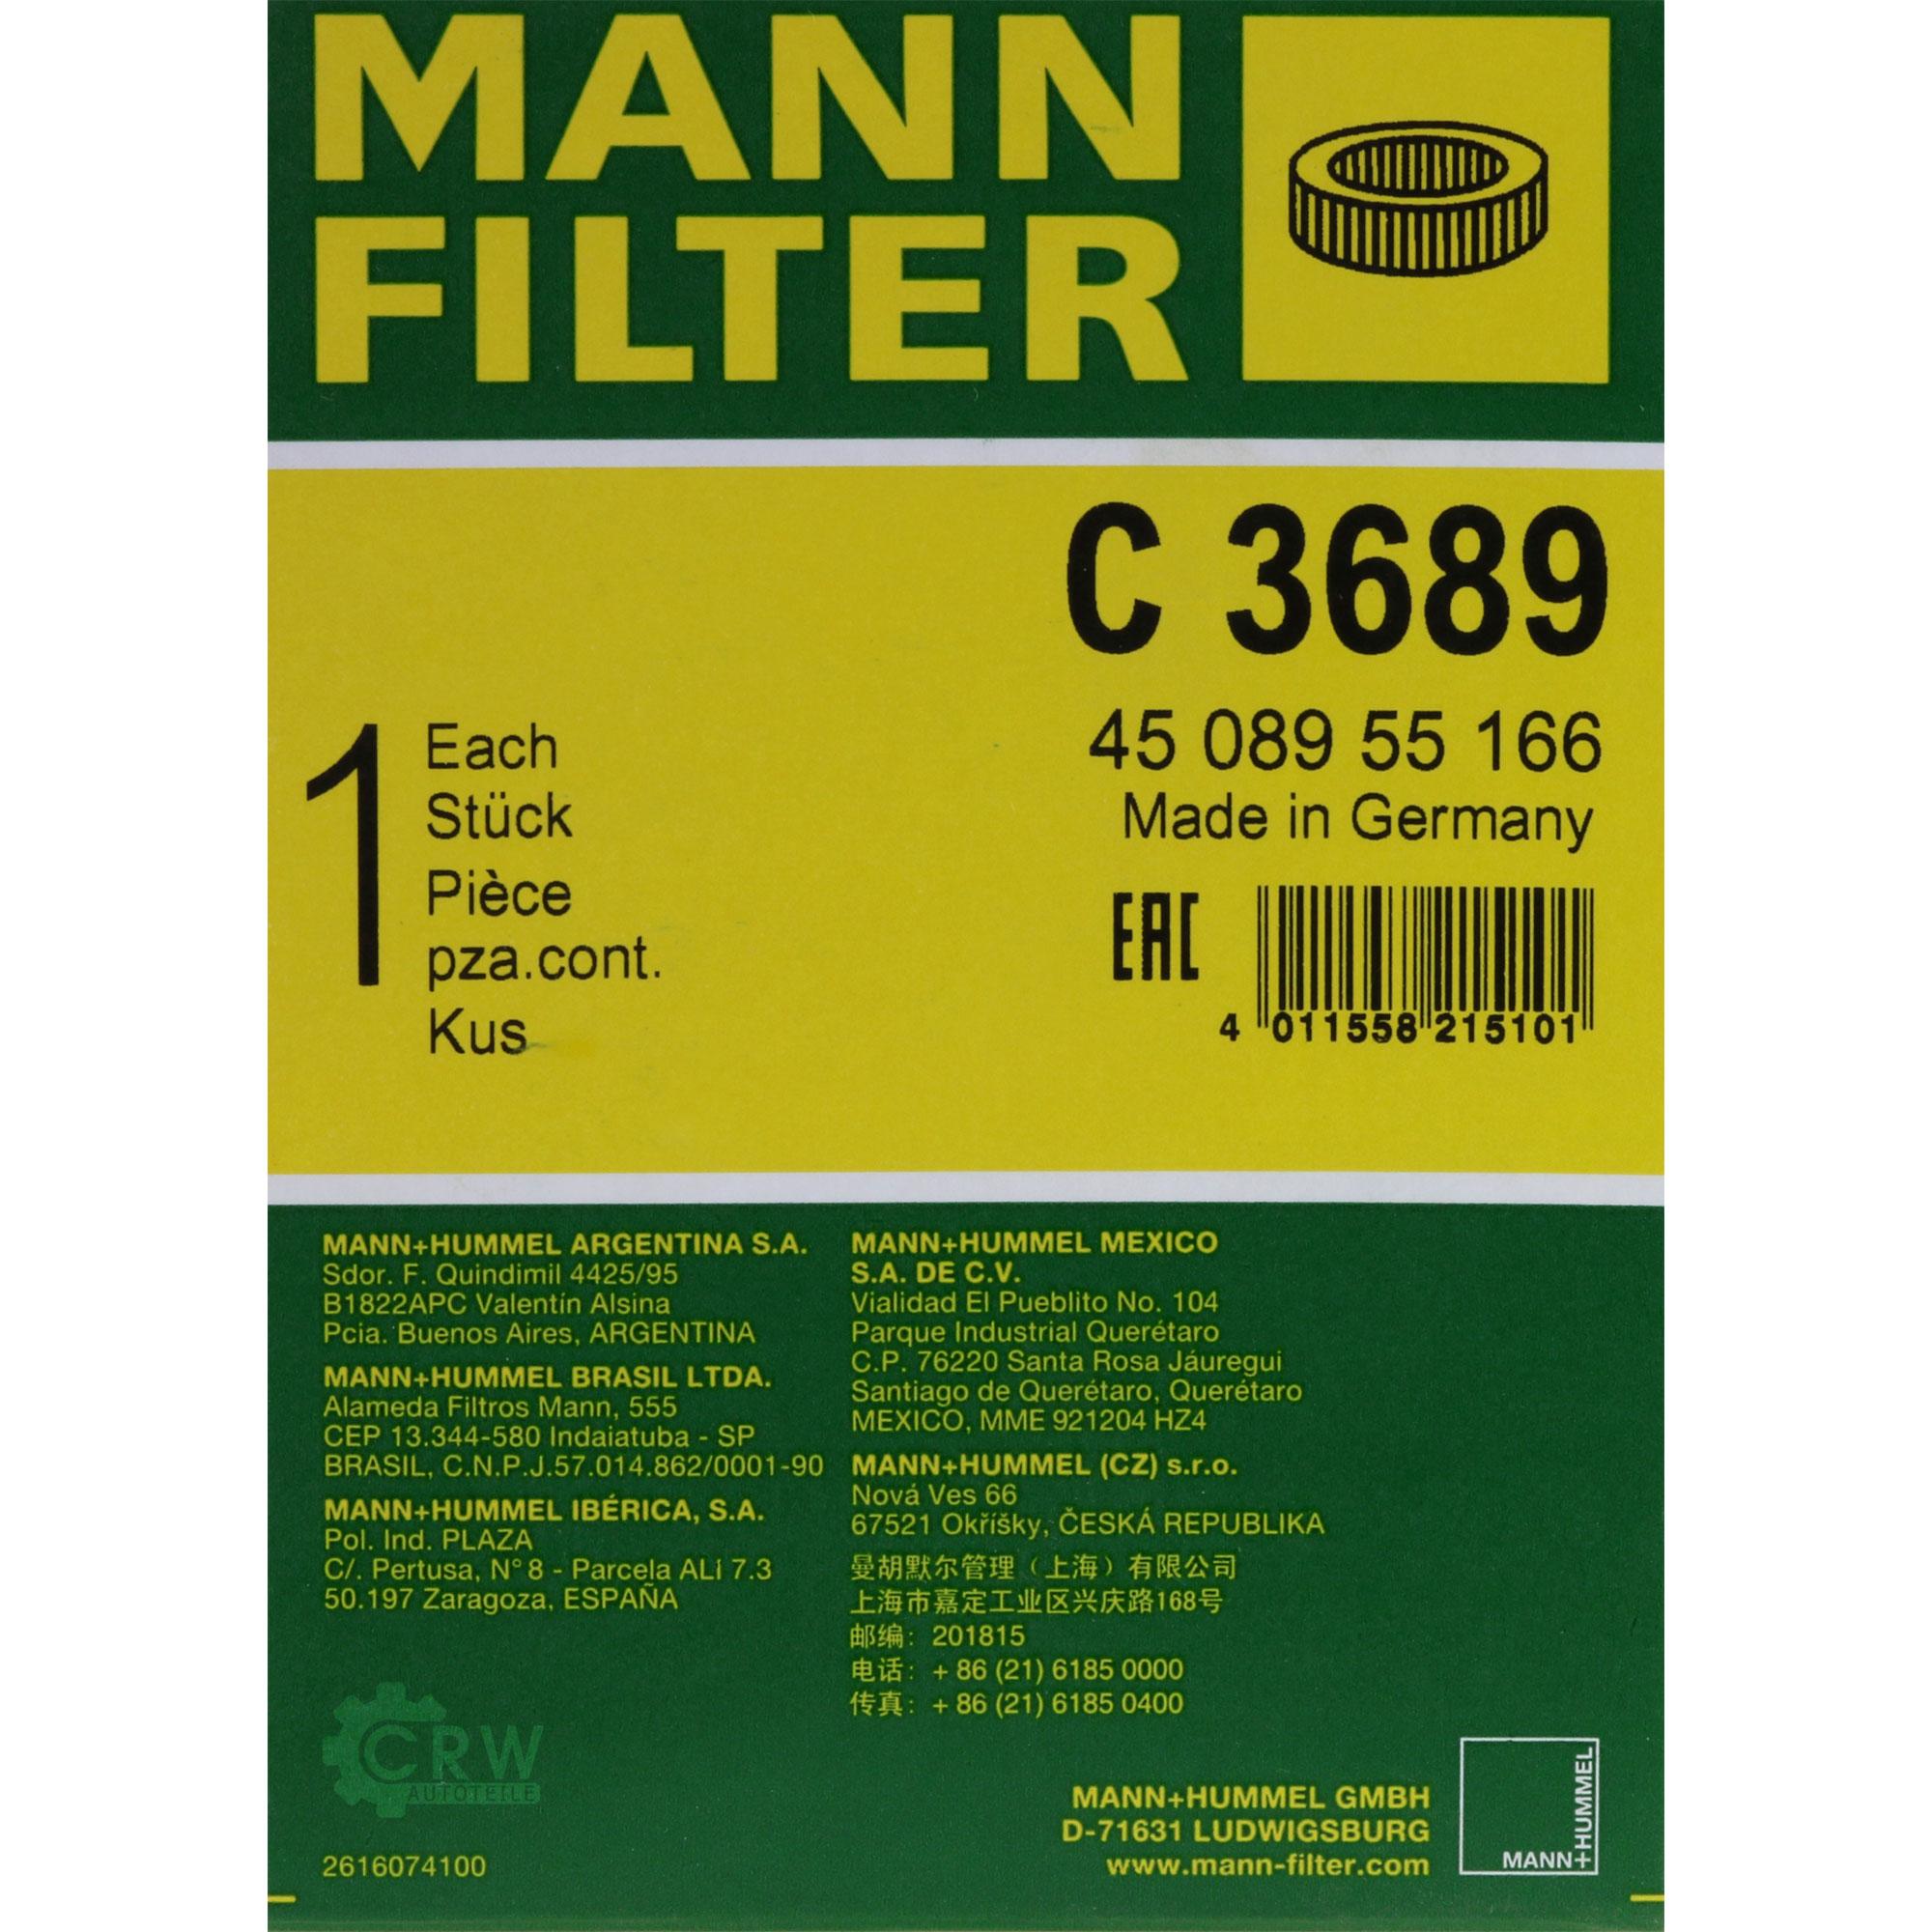 MANNOL-9L-Extreme-5W-40-Motor-Ol-MANN-FILTER-Mercedes-CLK-C209-500-SL-R230-350 Indexbild 9